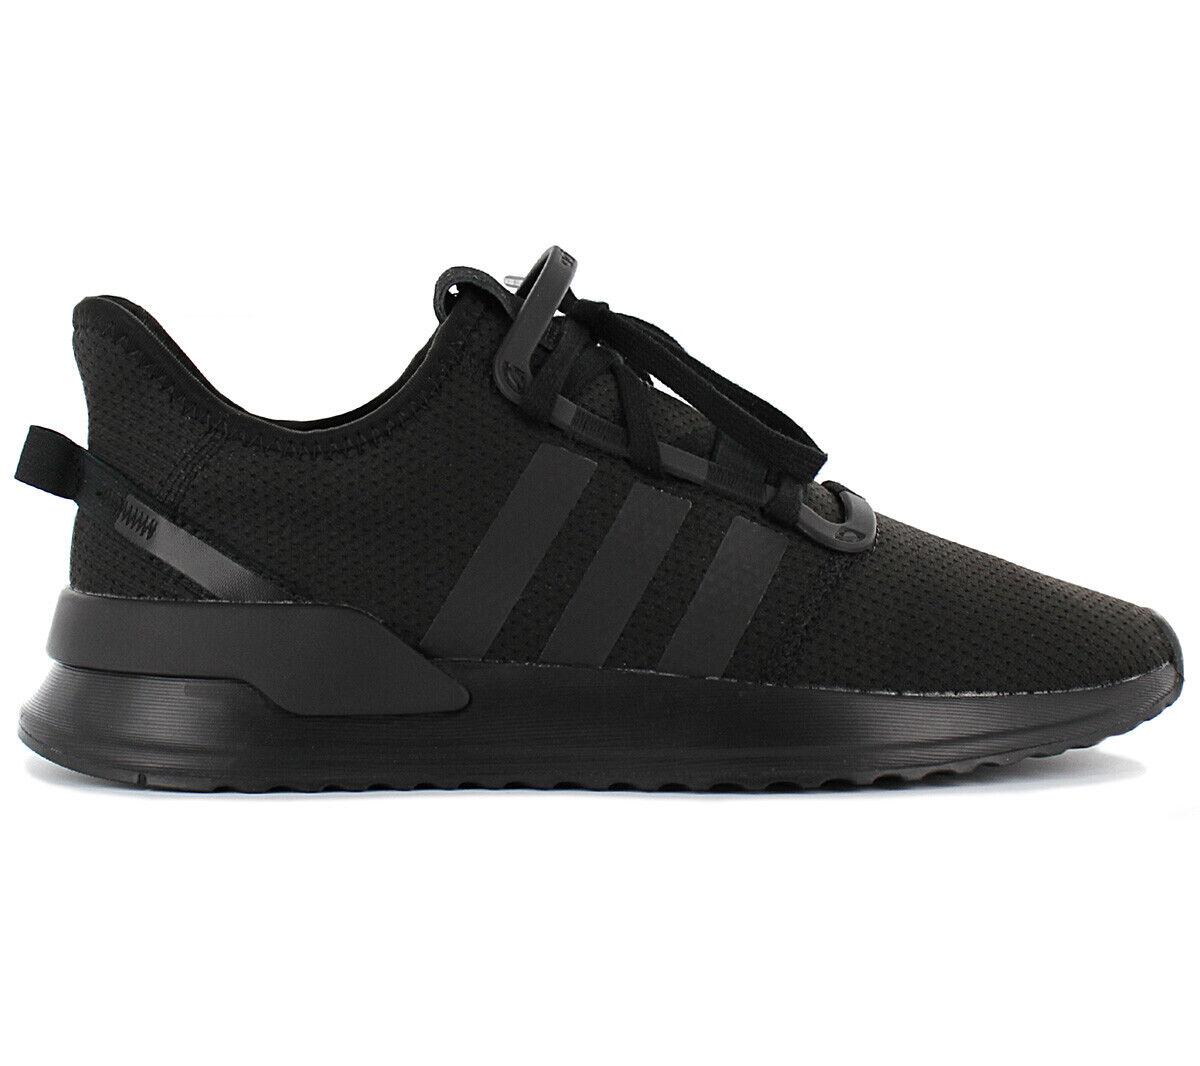 adidas Originals U_PATH RUN Herren Turnschuhe G27636 Schwarz Schuhe Turnschuhe NEU